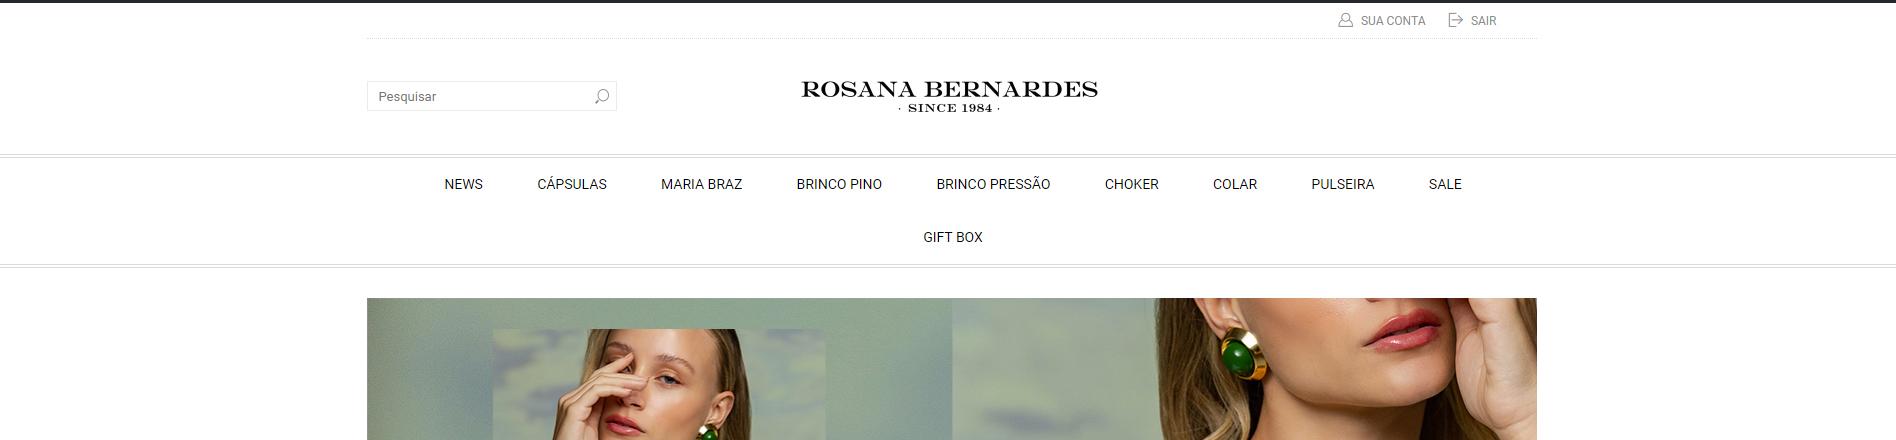 https://rosanabernardes.com.br/wp-content/uploads/2020/12/menu-expand.jpg